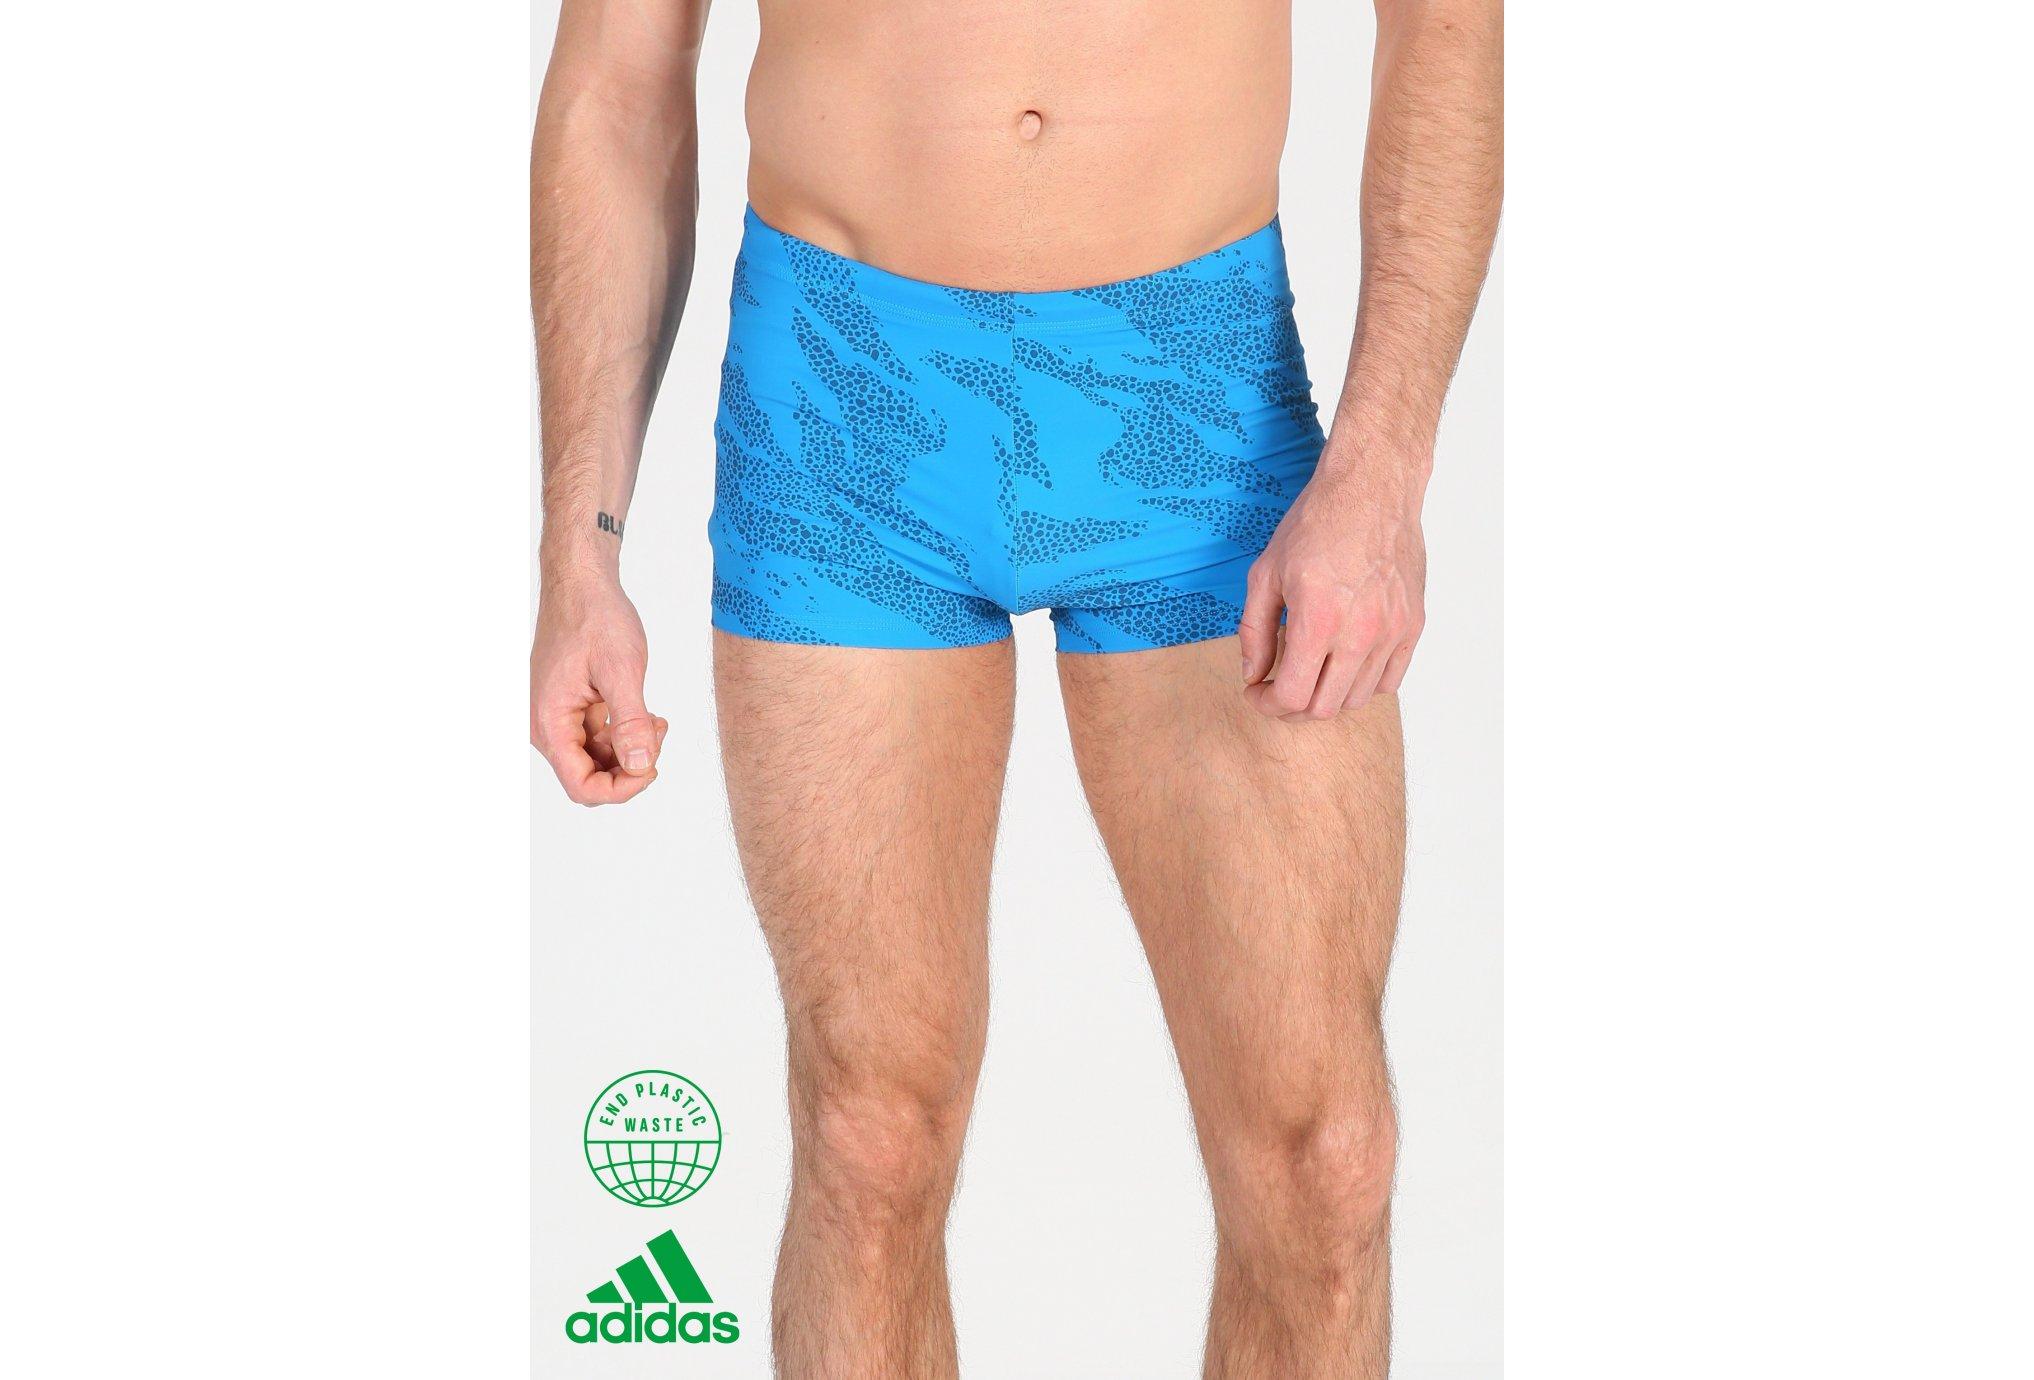 adidas Boxer Primeblue M vêtement running homme